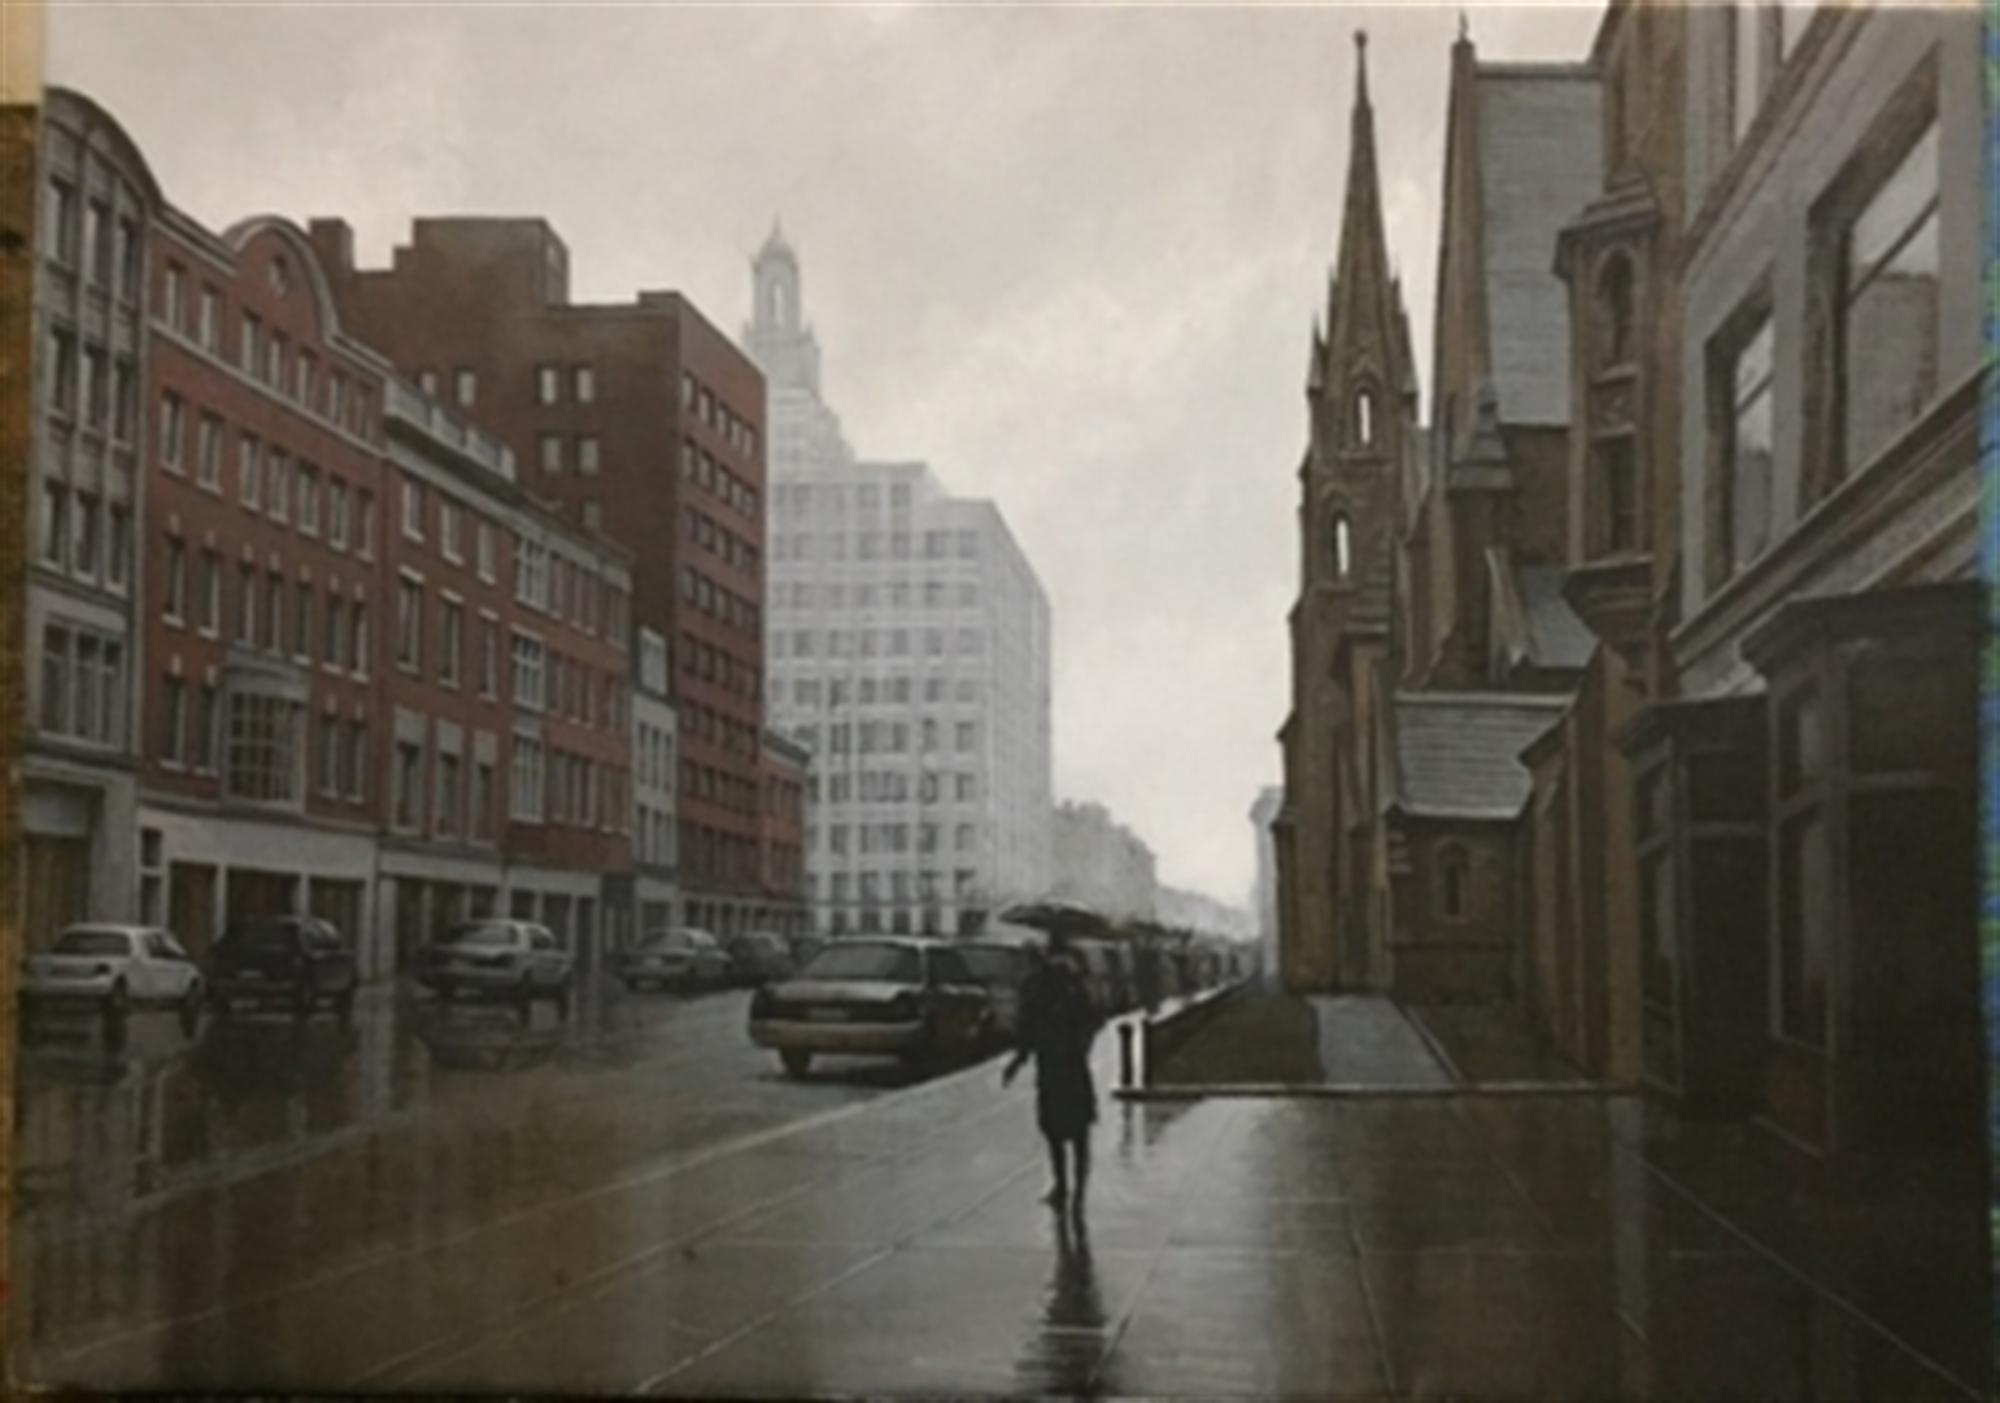 Boston Rain by Alexei Butirskiy